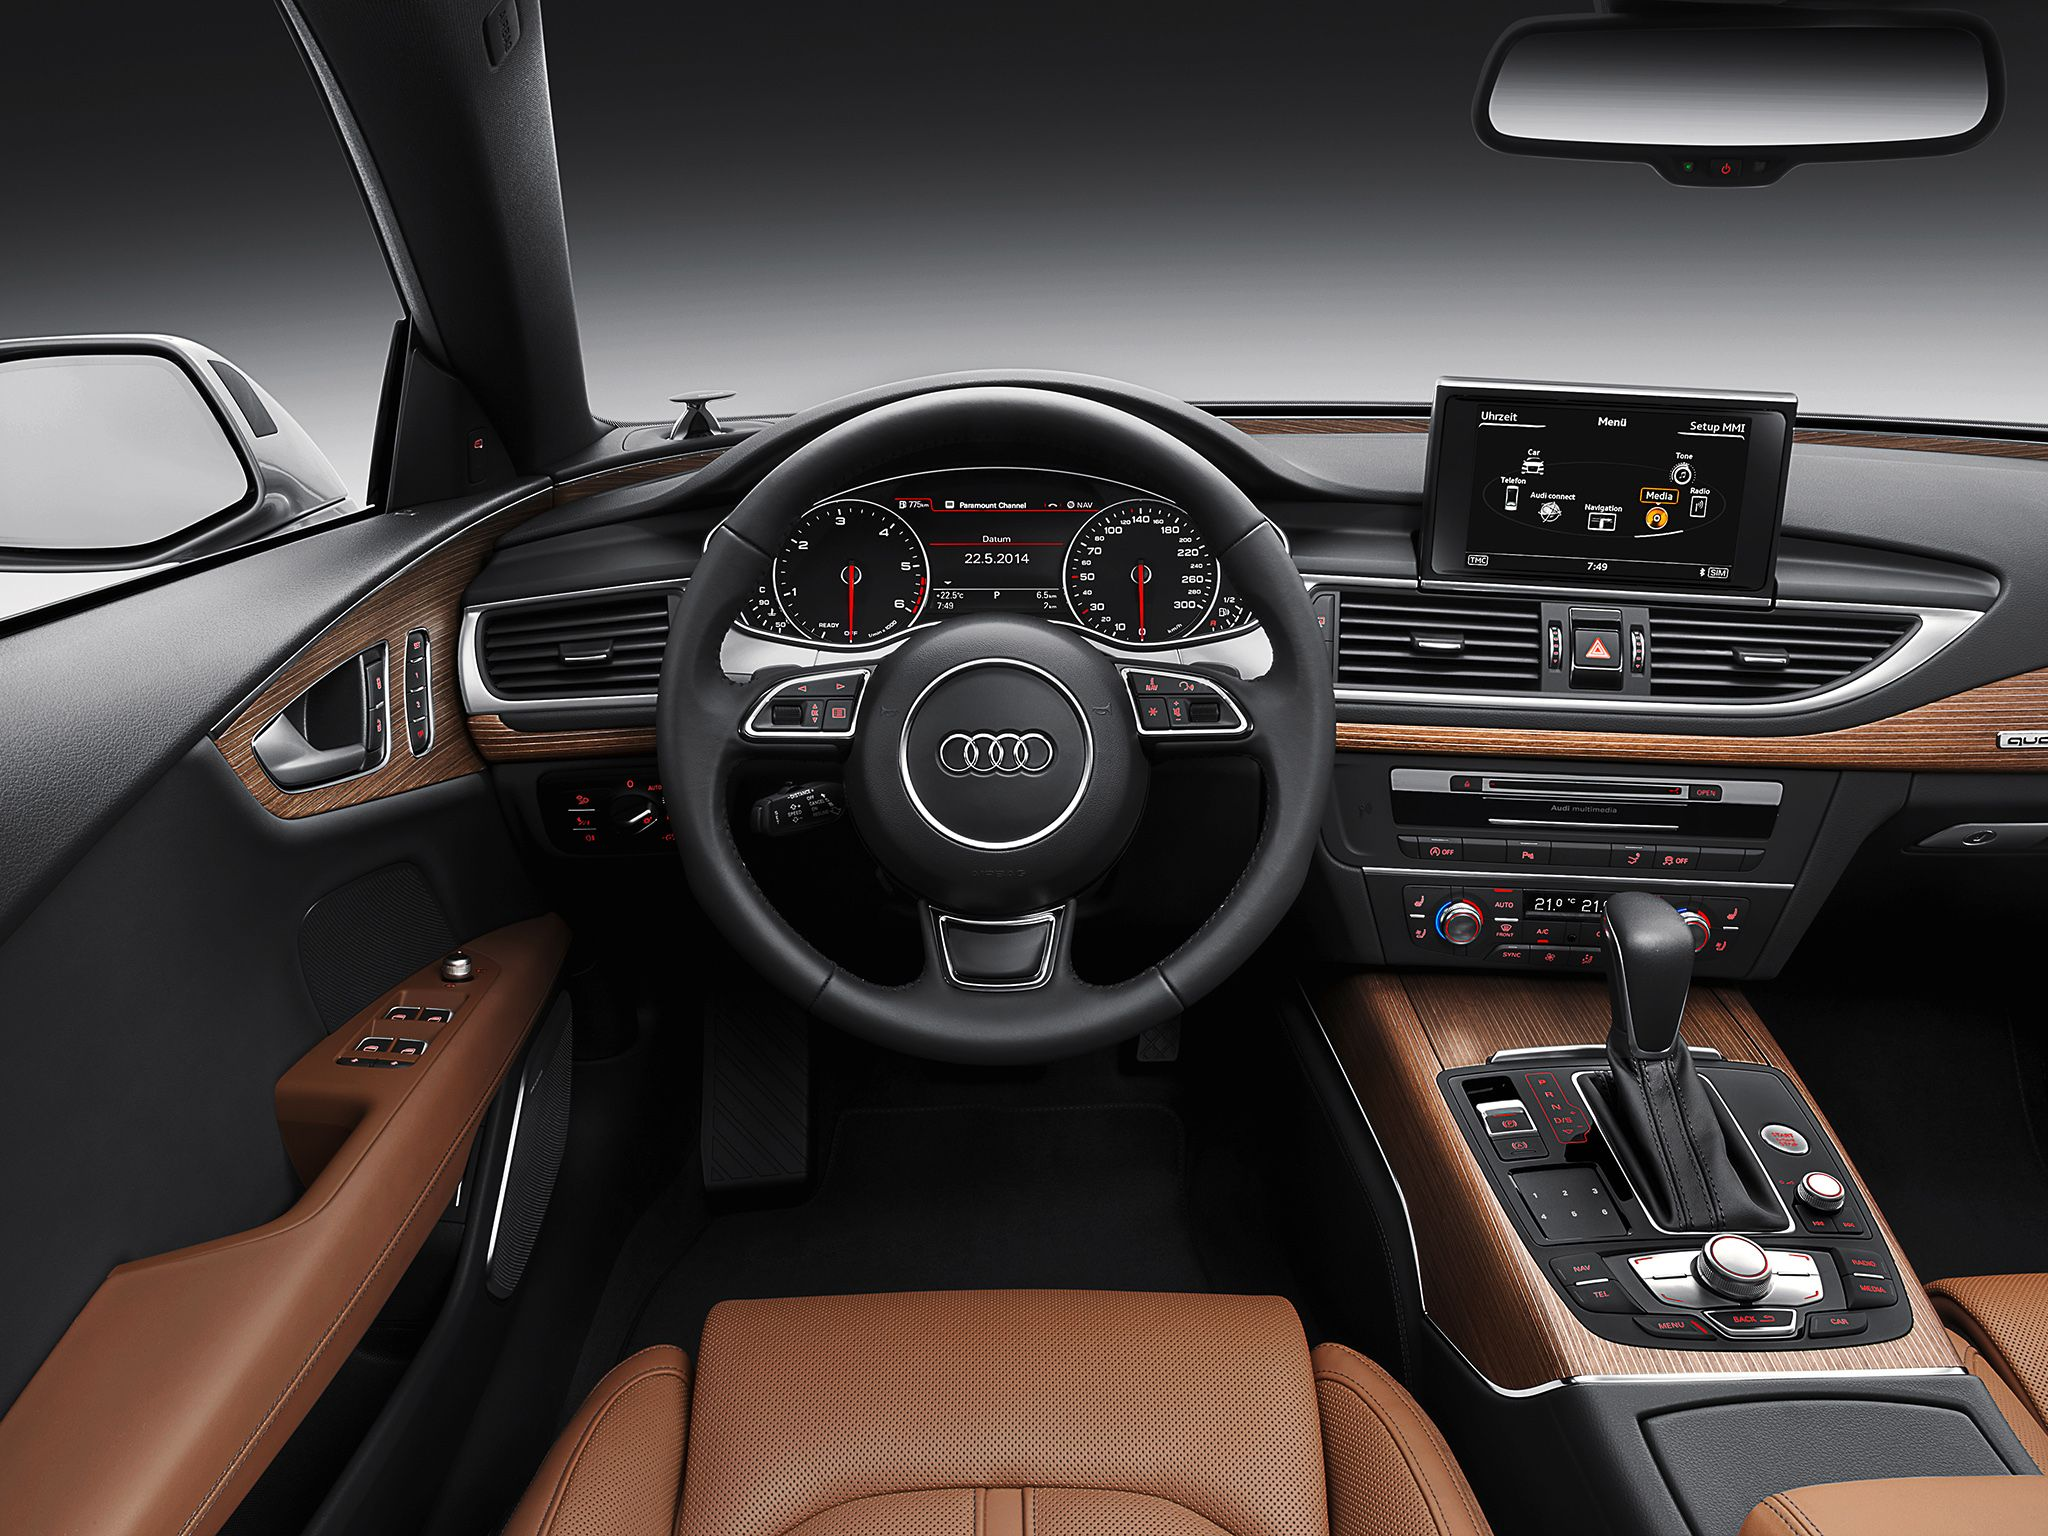 Audi A7 Sportback 3 0 Tdi Quattro S Line Worldwide 2014 18 Audi A7 Sportback Audi A7 Audi A7 Interior